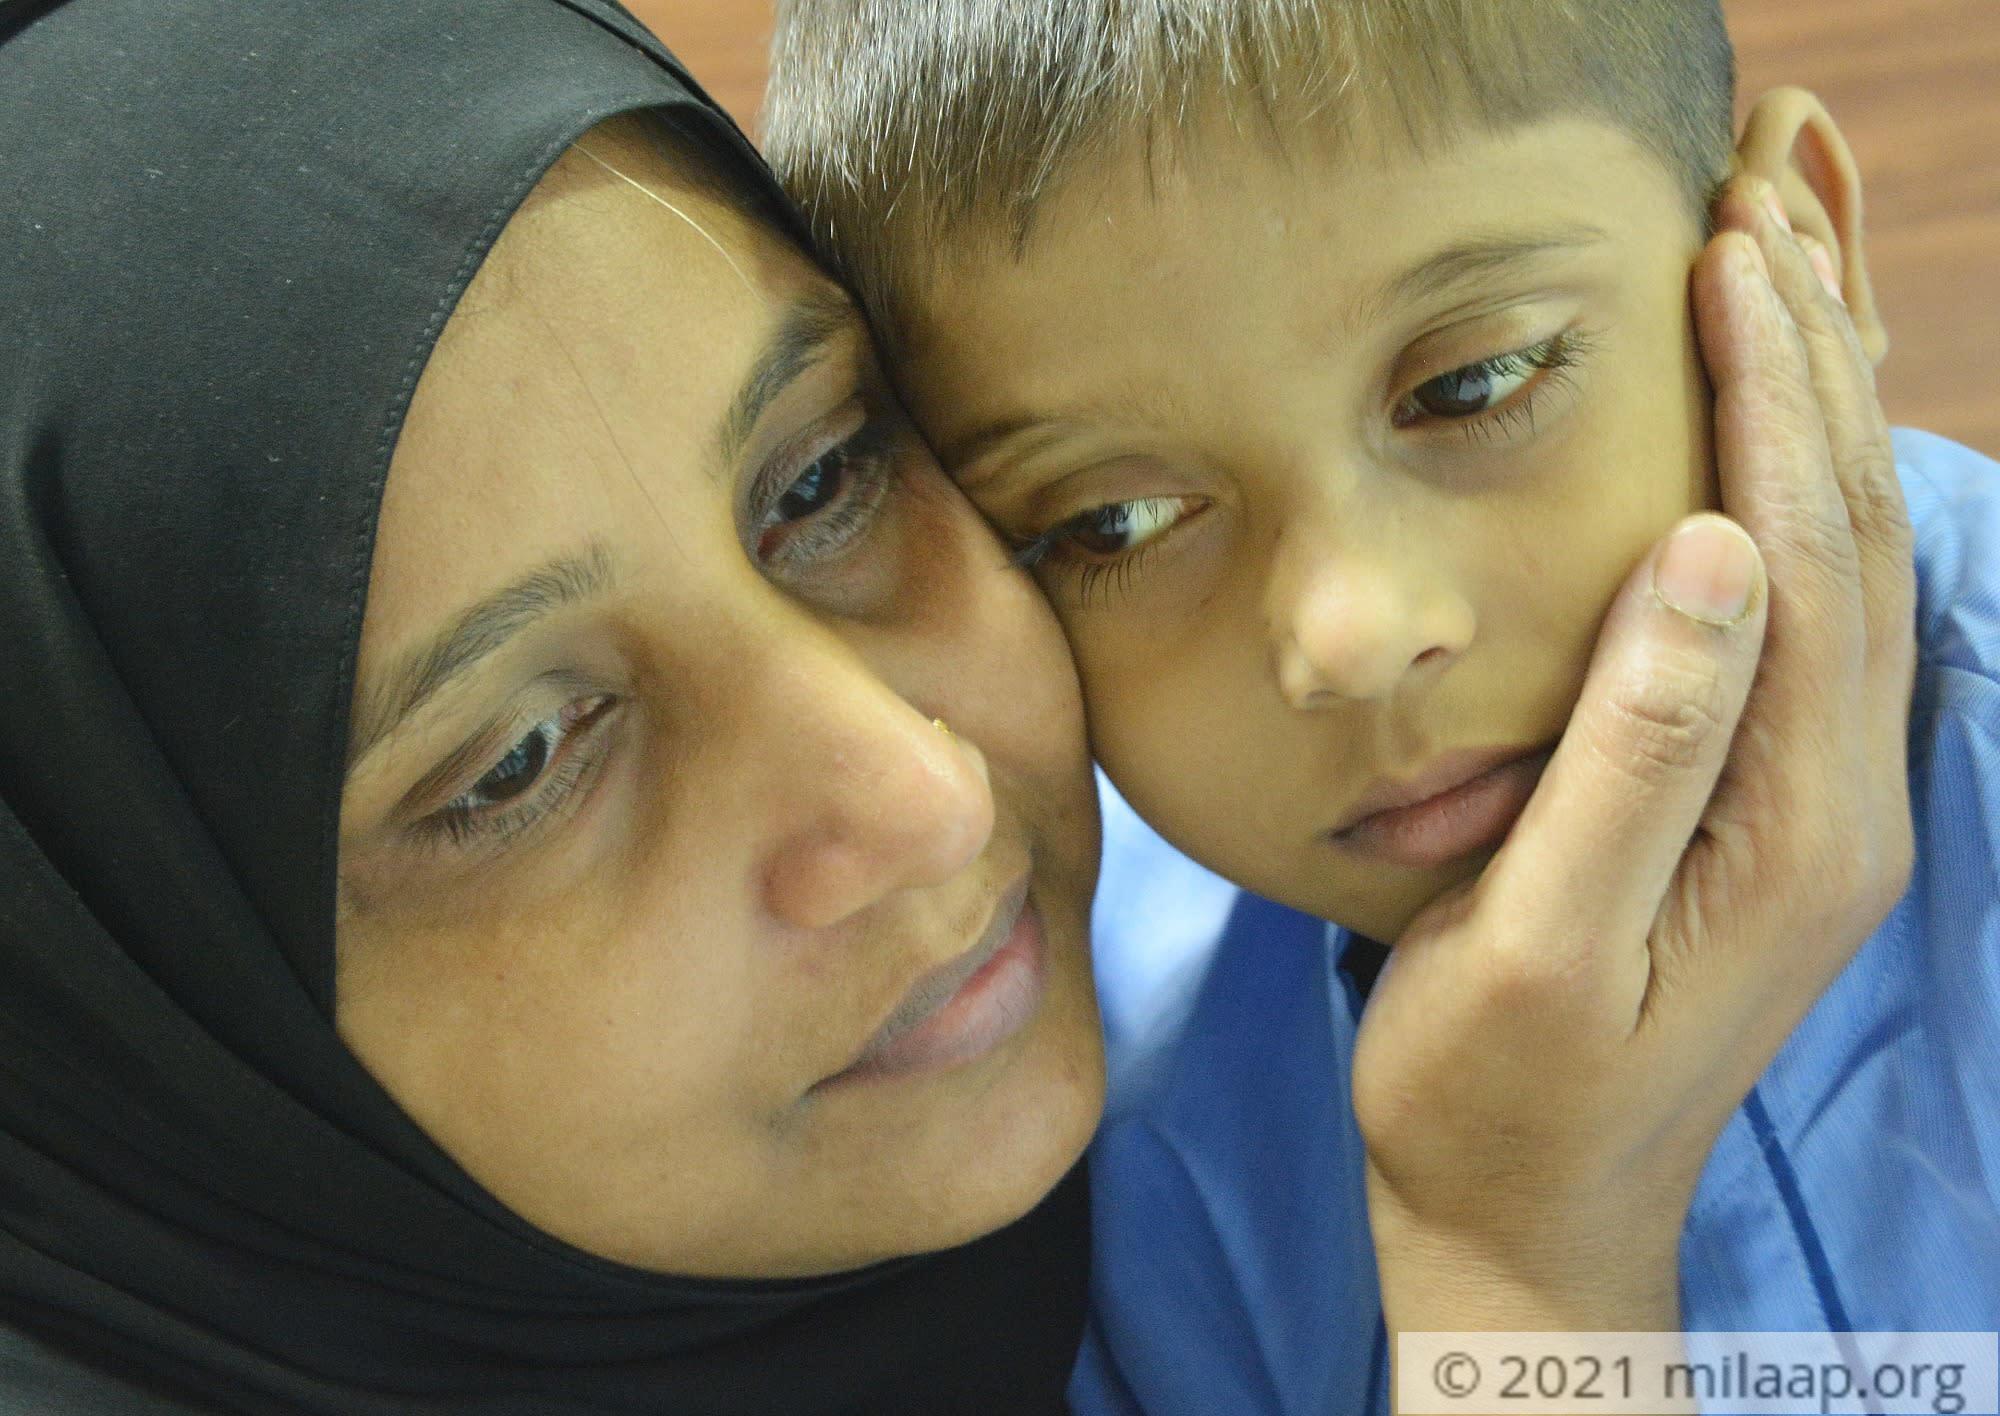 Hammad global hospital 10 uktevg 1571245060